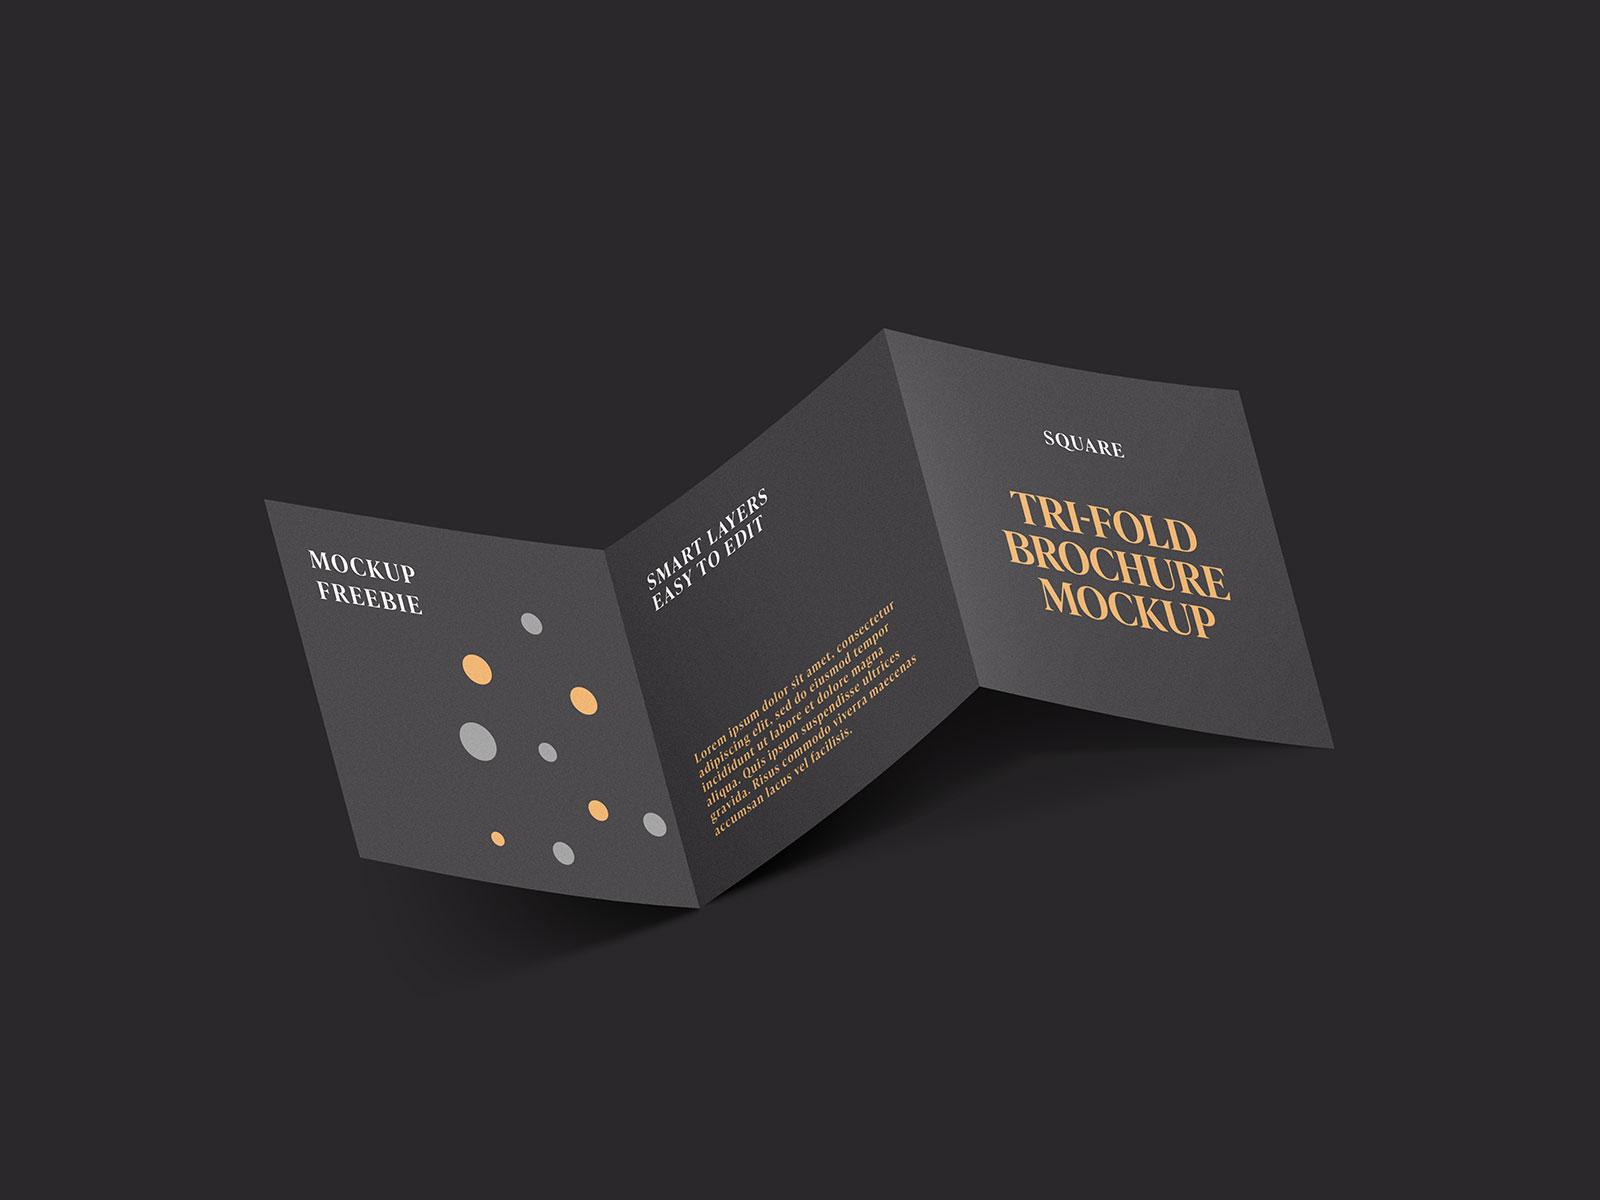 Free-Dark-Square-Tri-fold-Brochure-Mockup-PSD